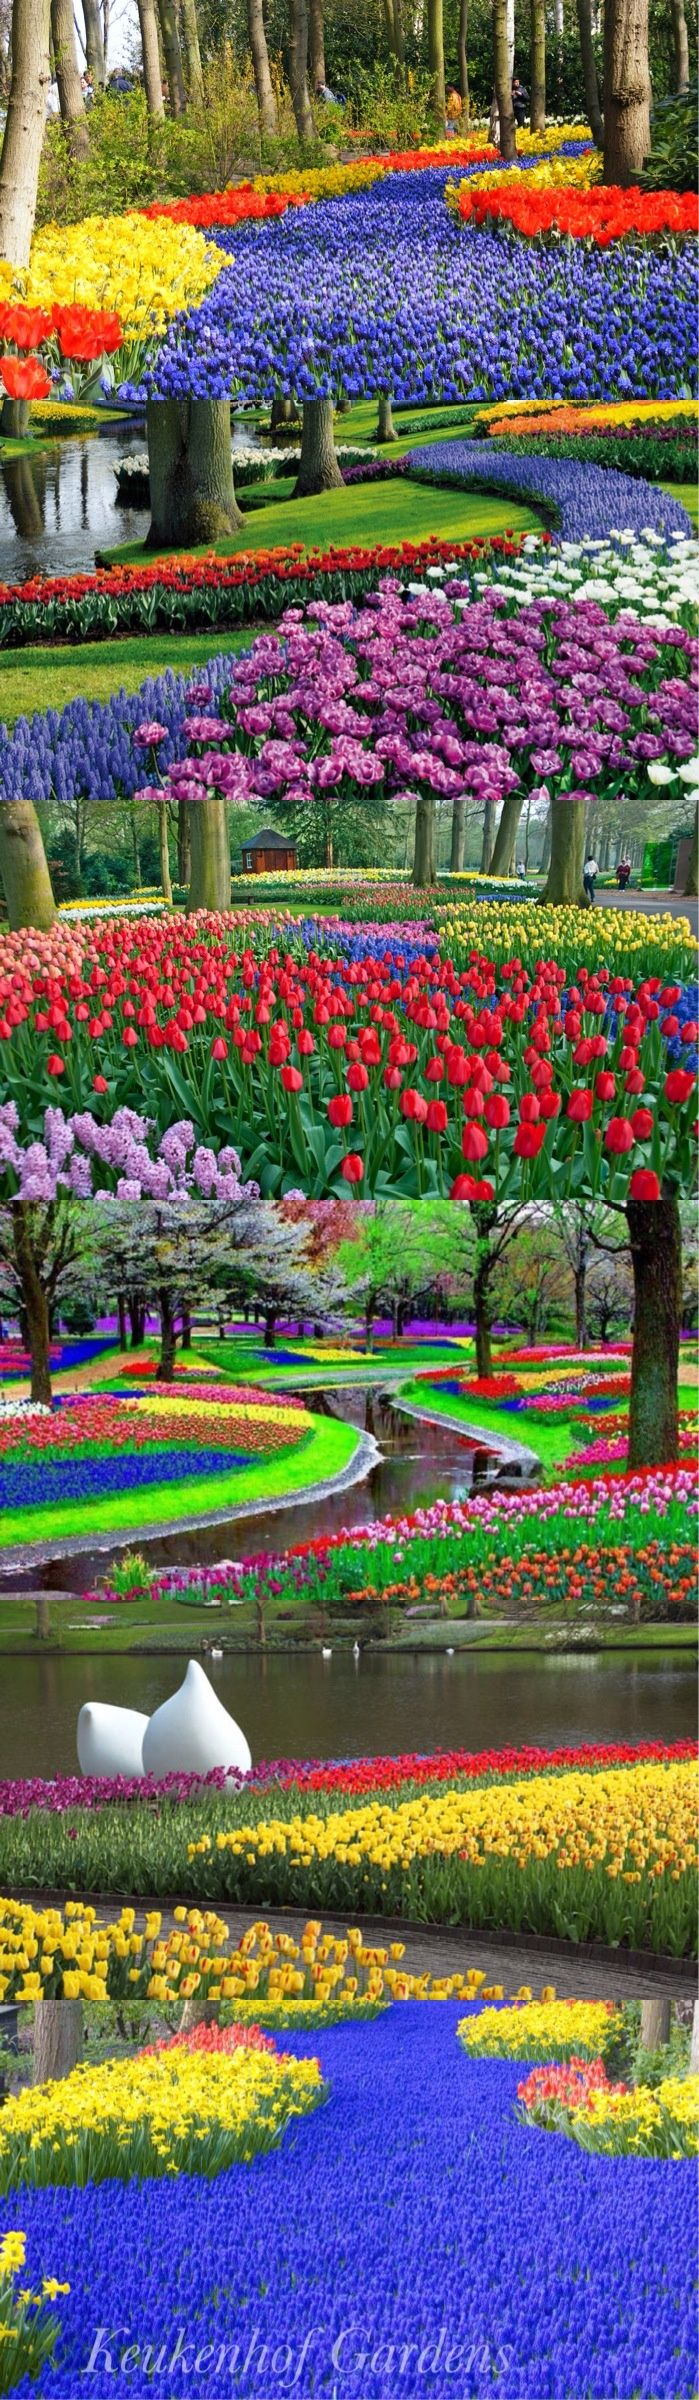 Best 20 Tulip Fields Ideas On Pinterest Tulip Festival